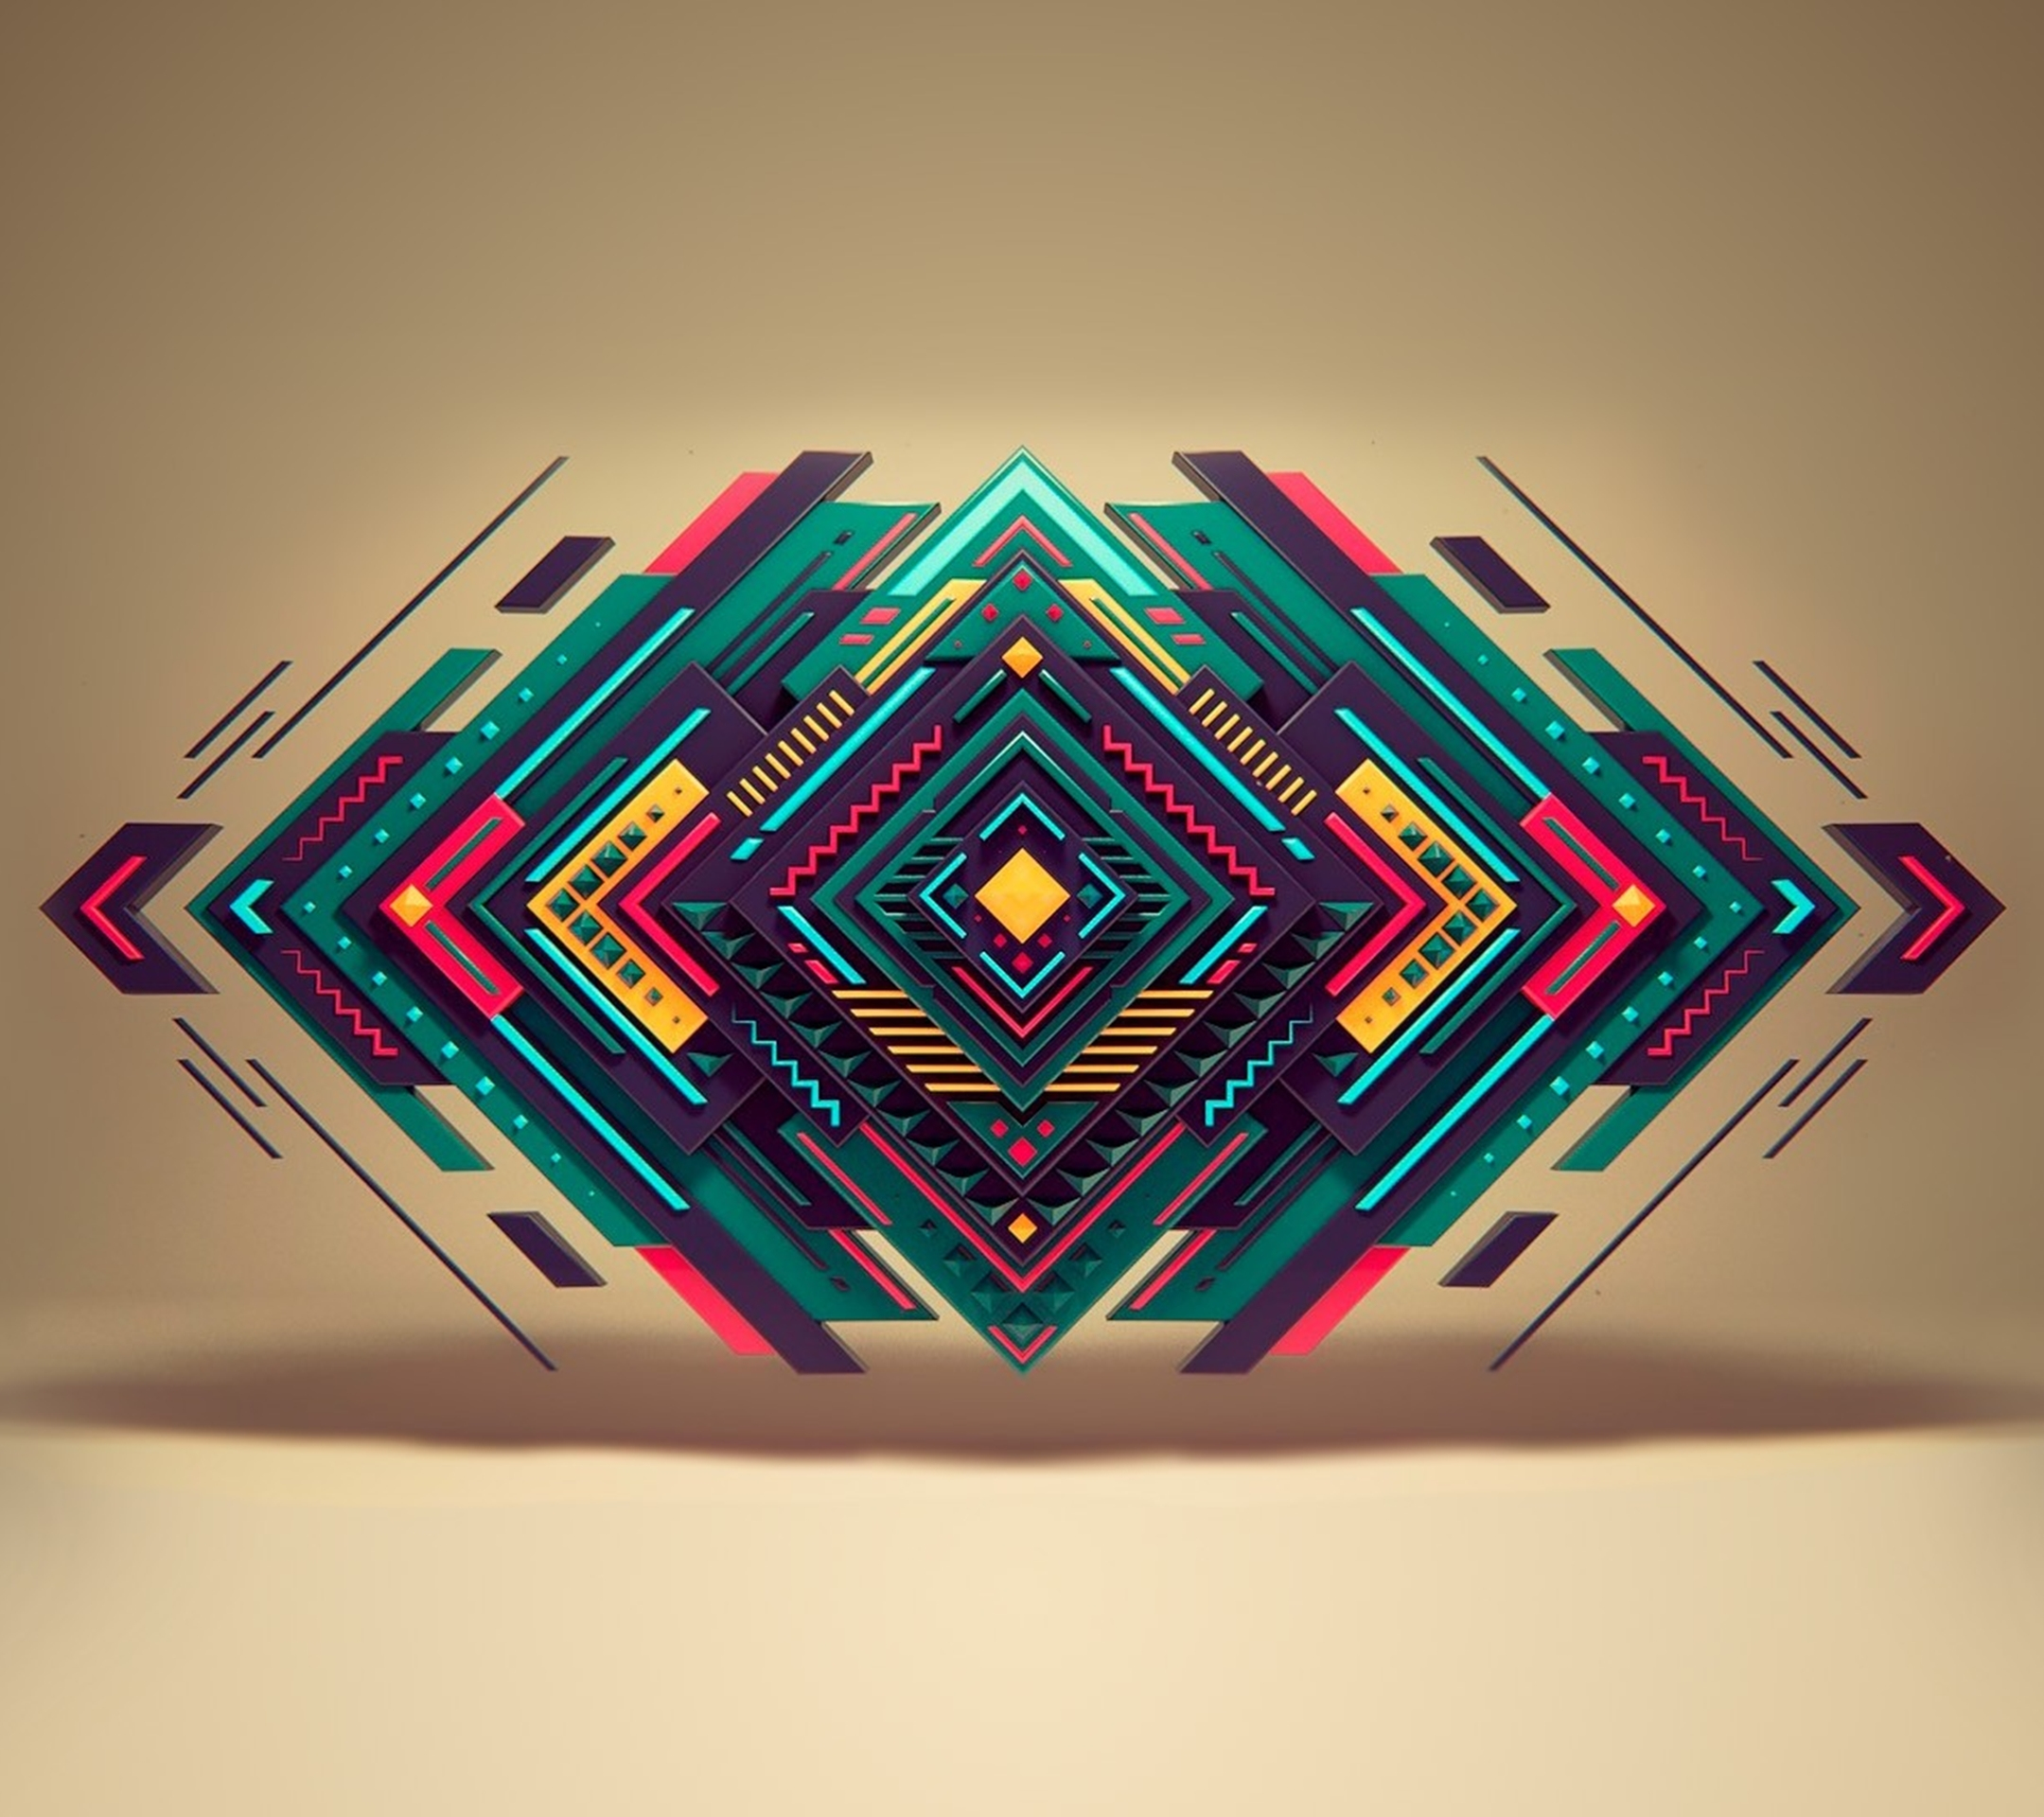 Geometry-HD-Samsung-Galaxy-S5-Wallpapers